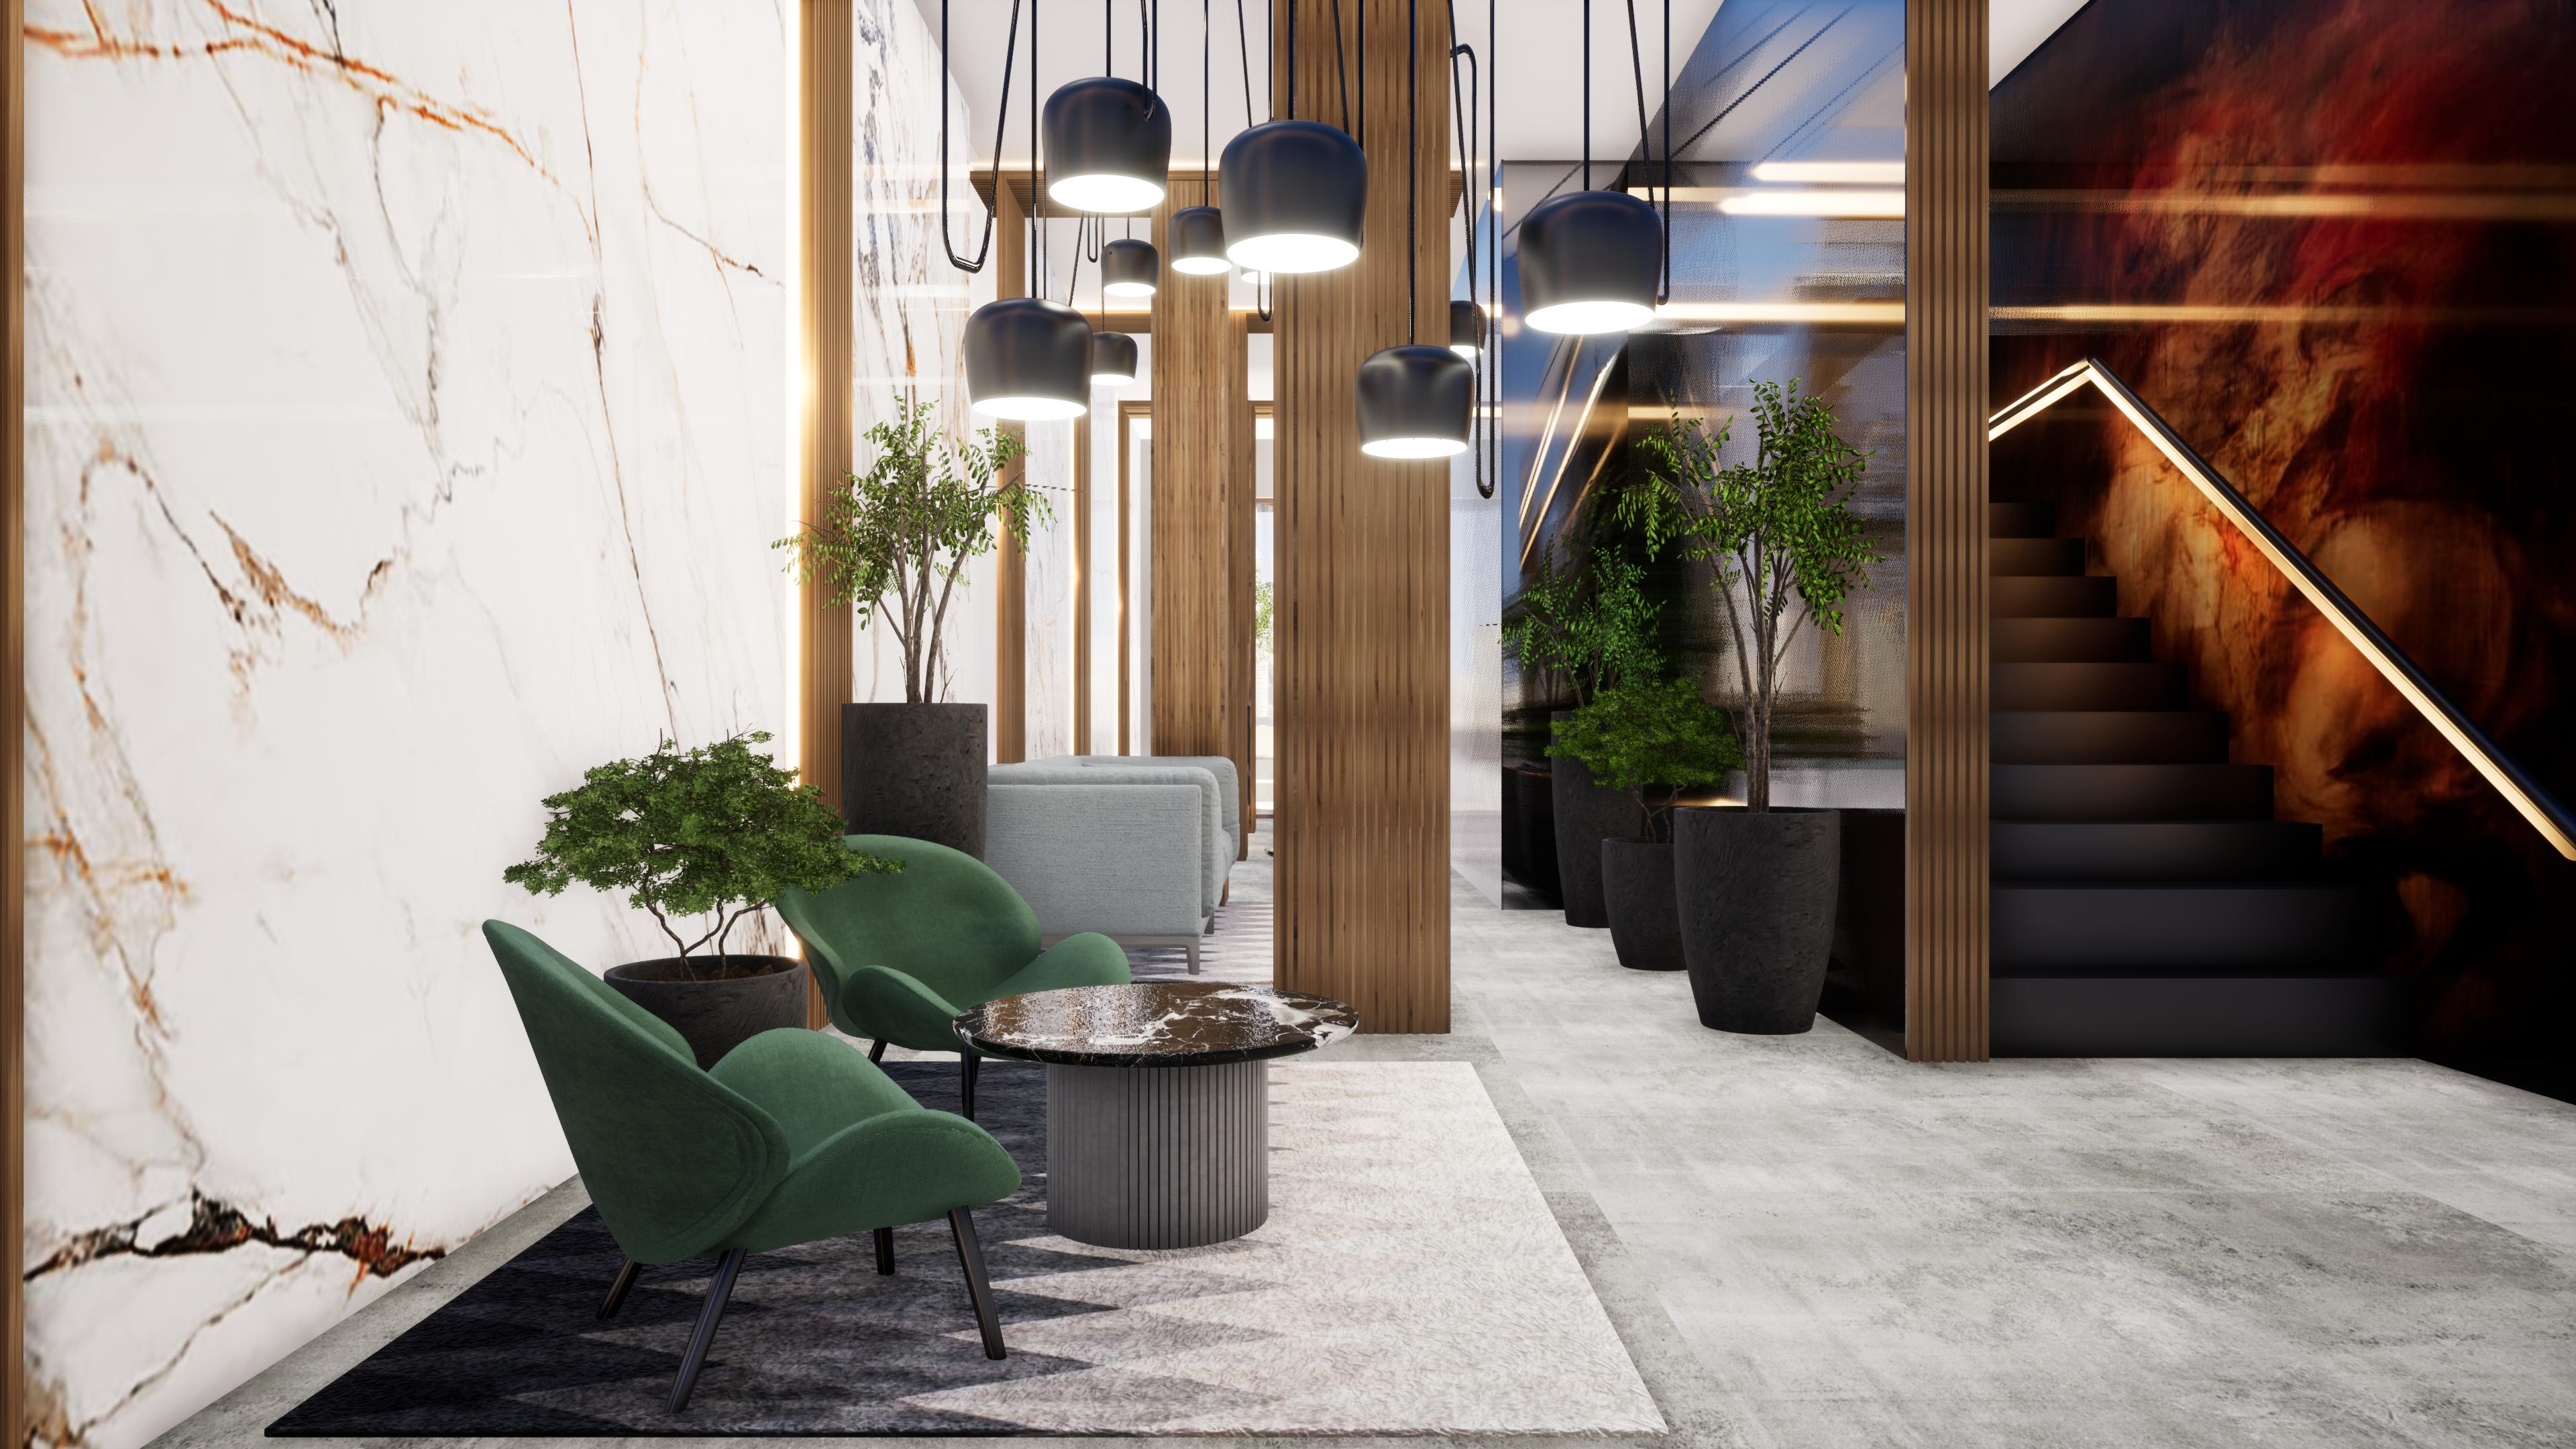 imbewu-design-greenside-concept-1